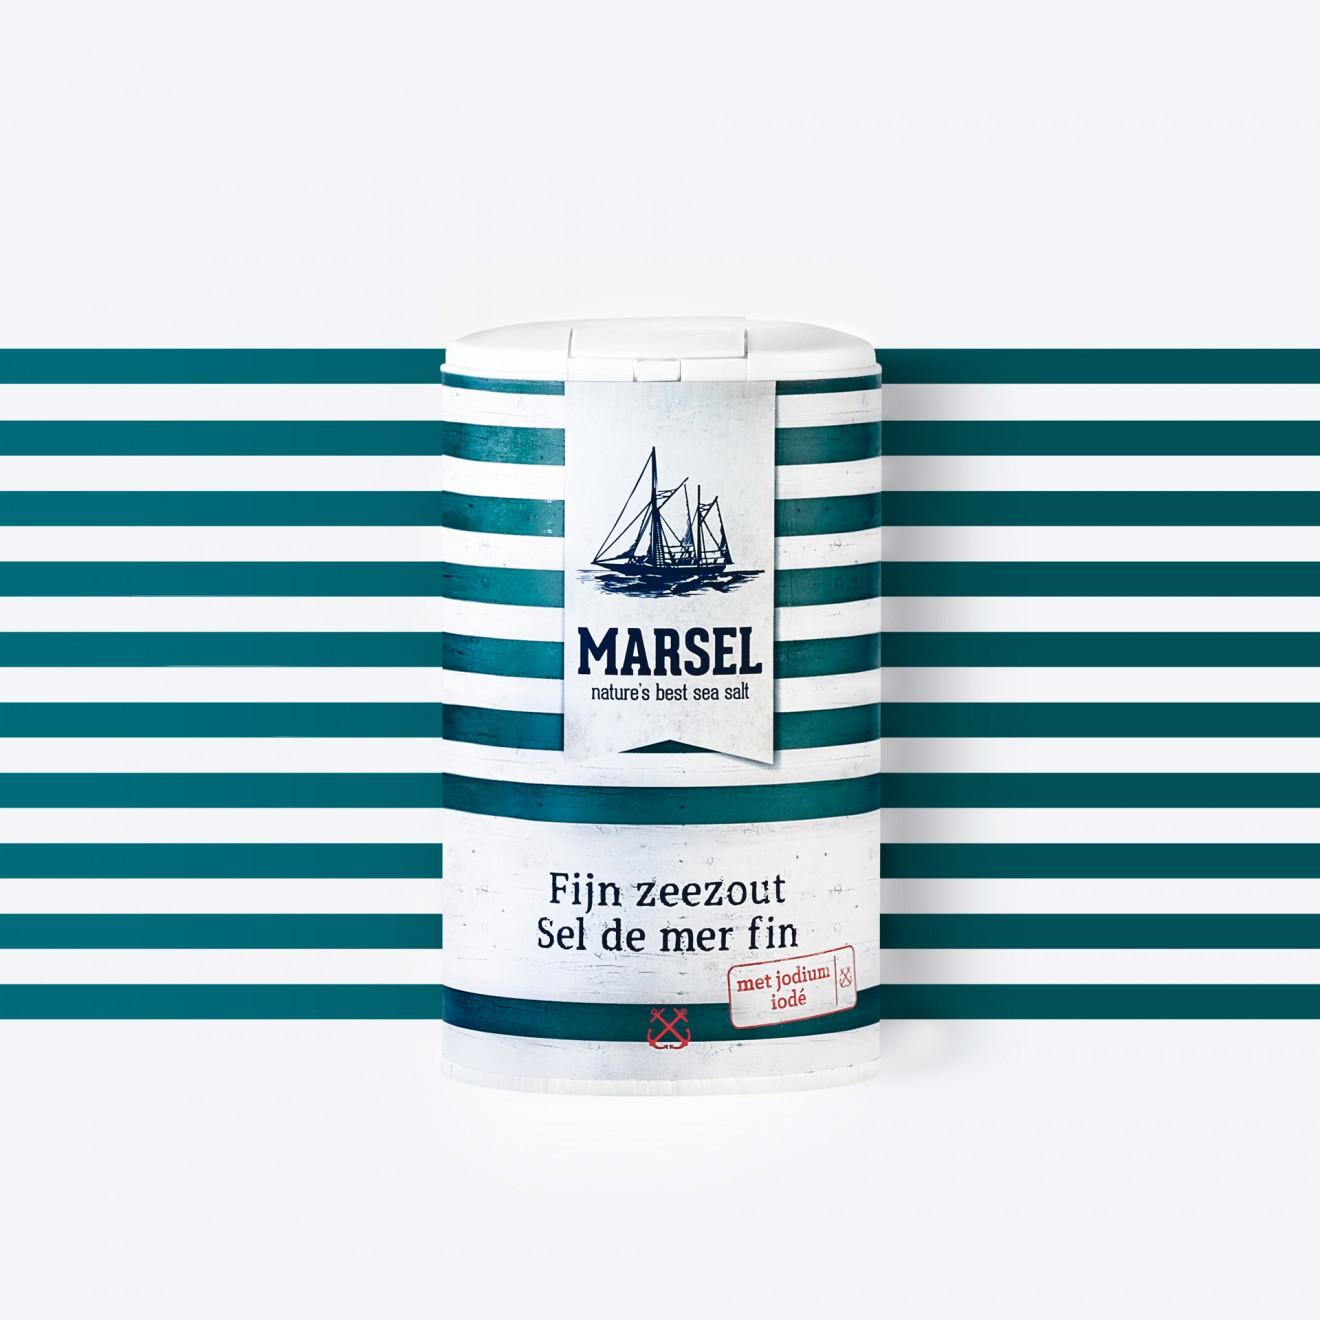 Quatre Mains package design - packaging, design, sailor, marsel